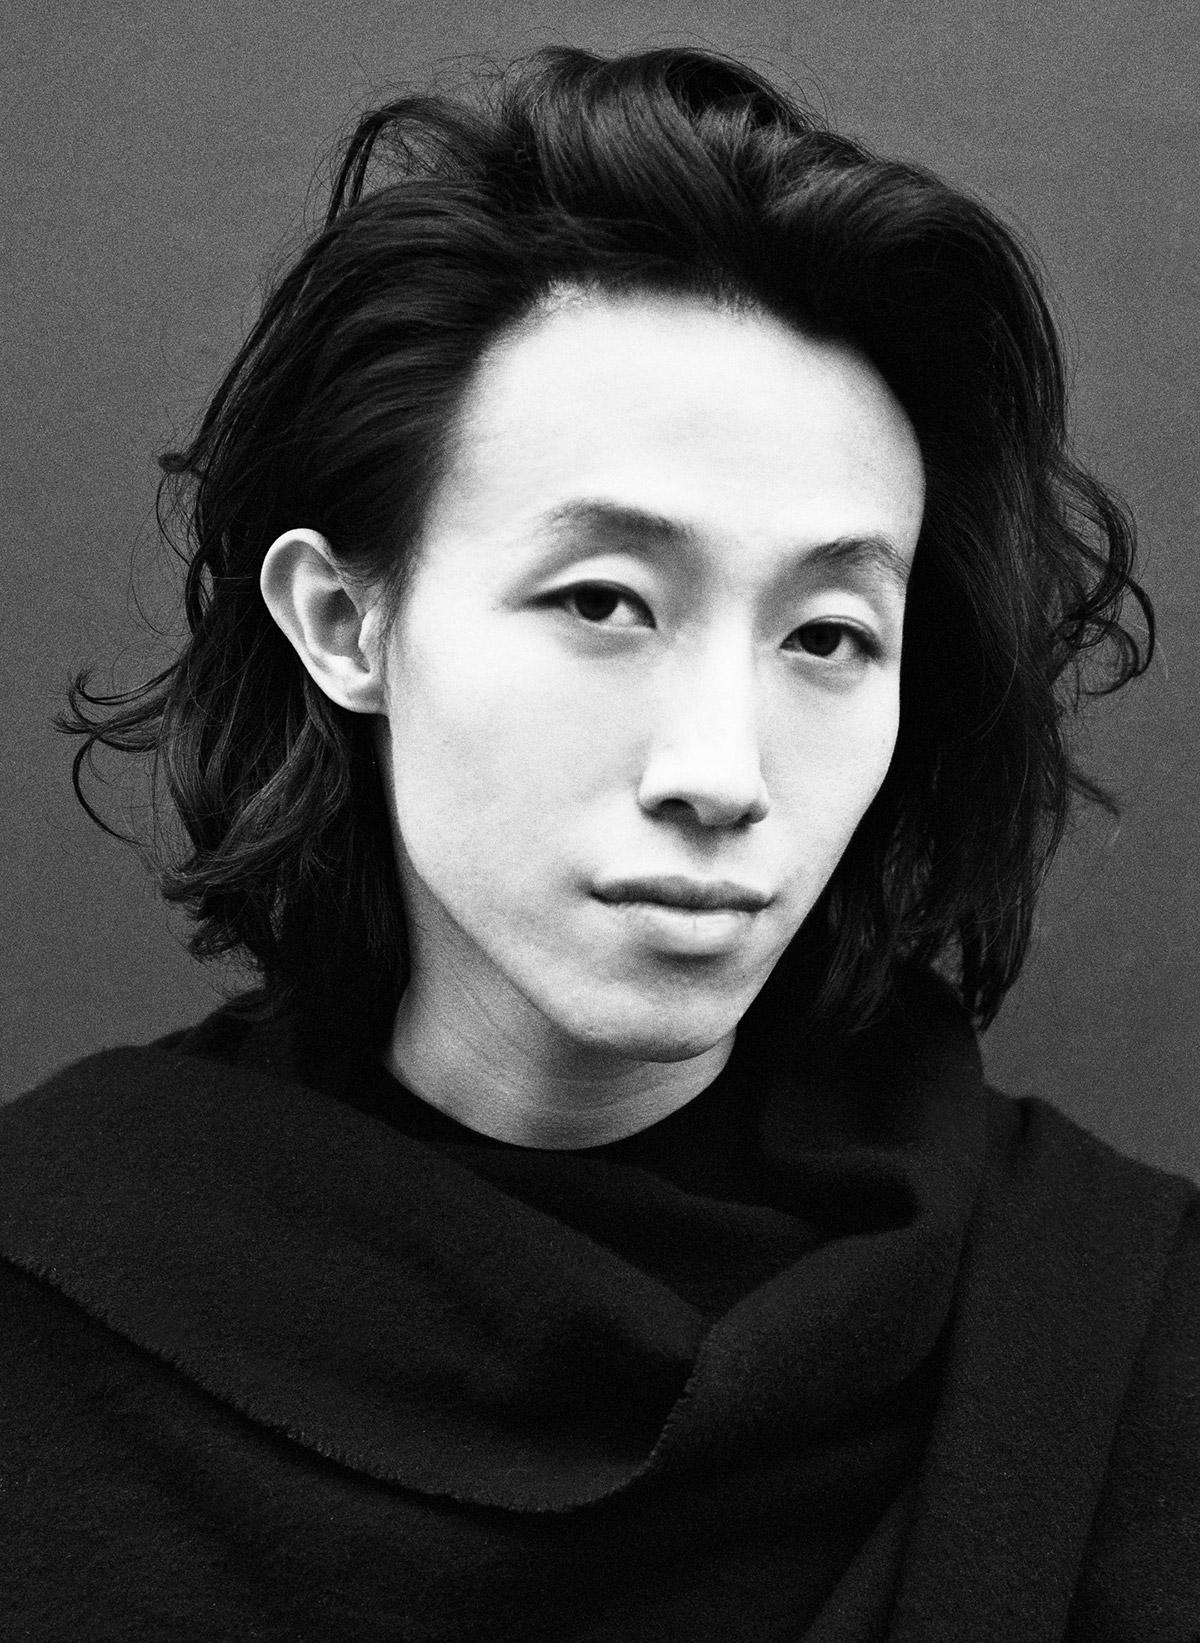 robert-wun-interview-portrait